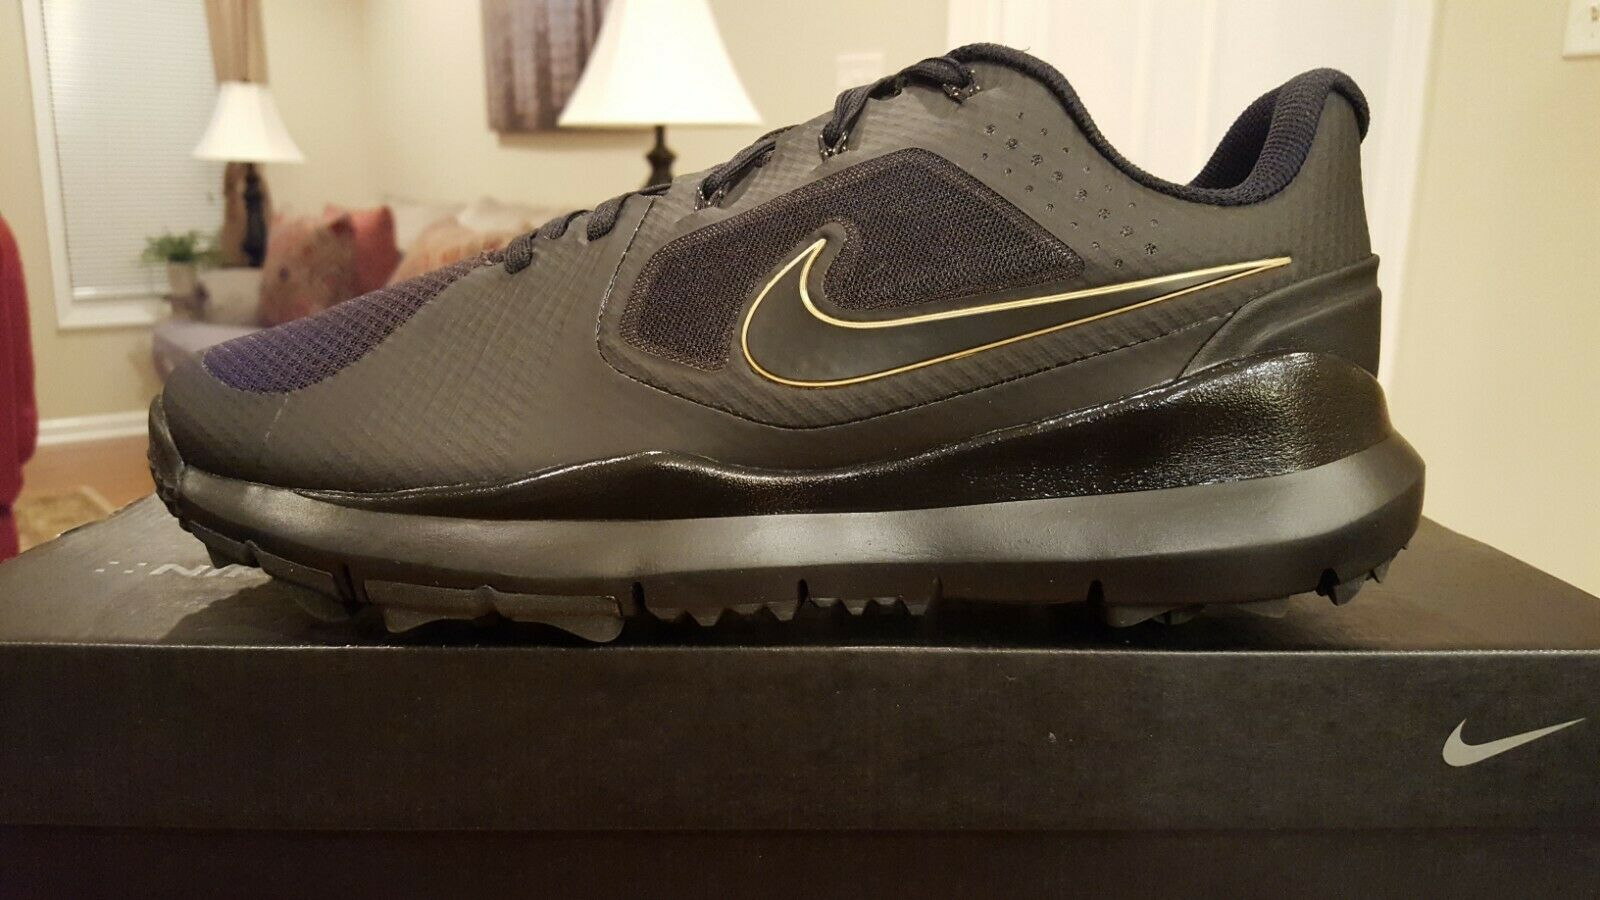 Nike TW 14 Mesh Golf Shoes 9 Tiger